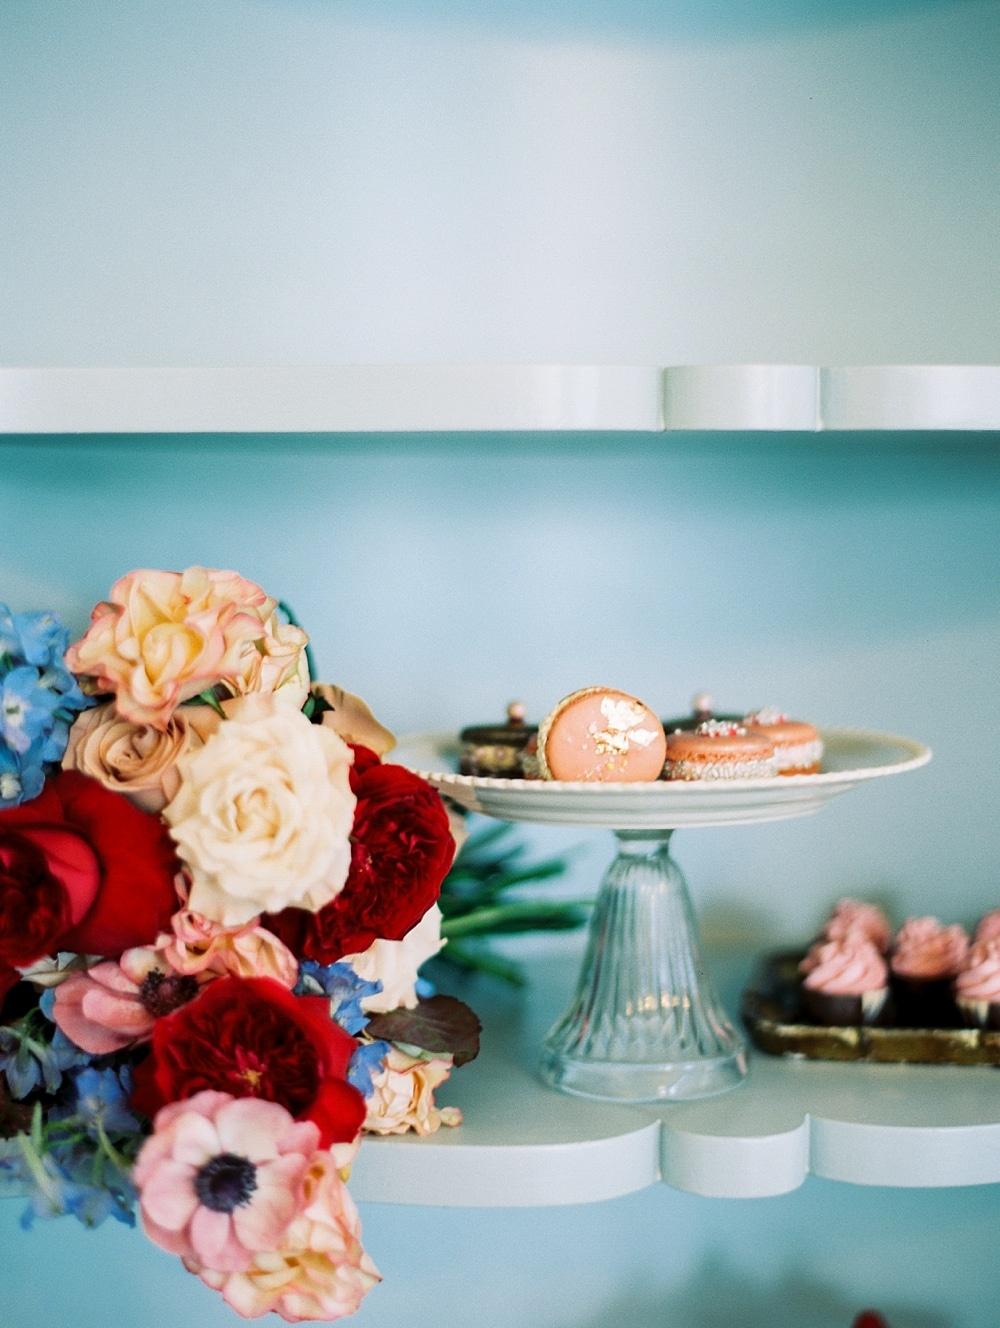 kristin-la-voie-photography-austin-wedding-photographer-woodbine-mansion-132